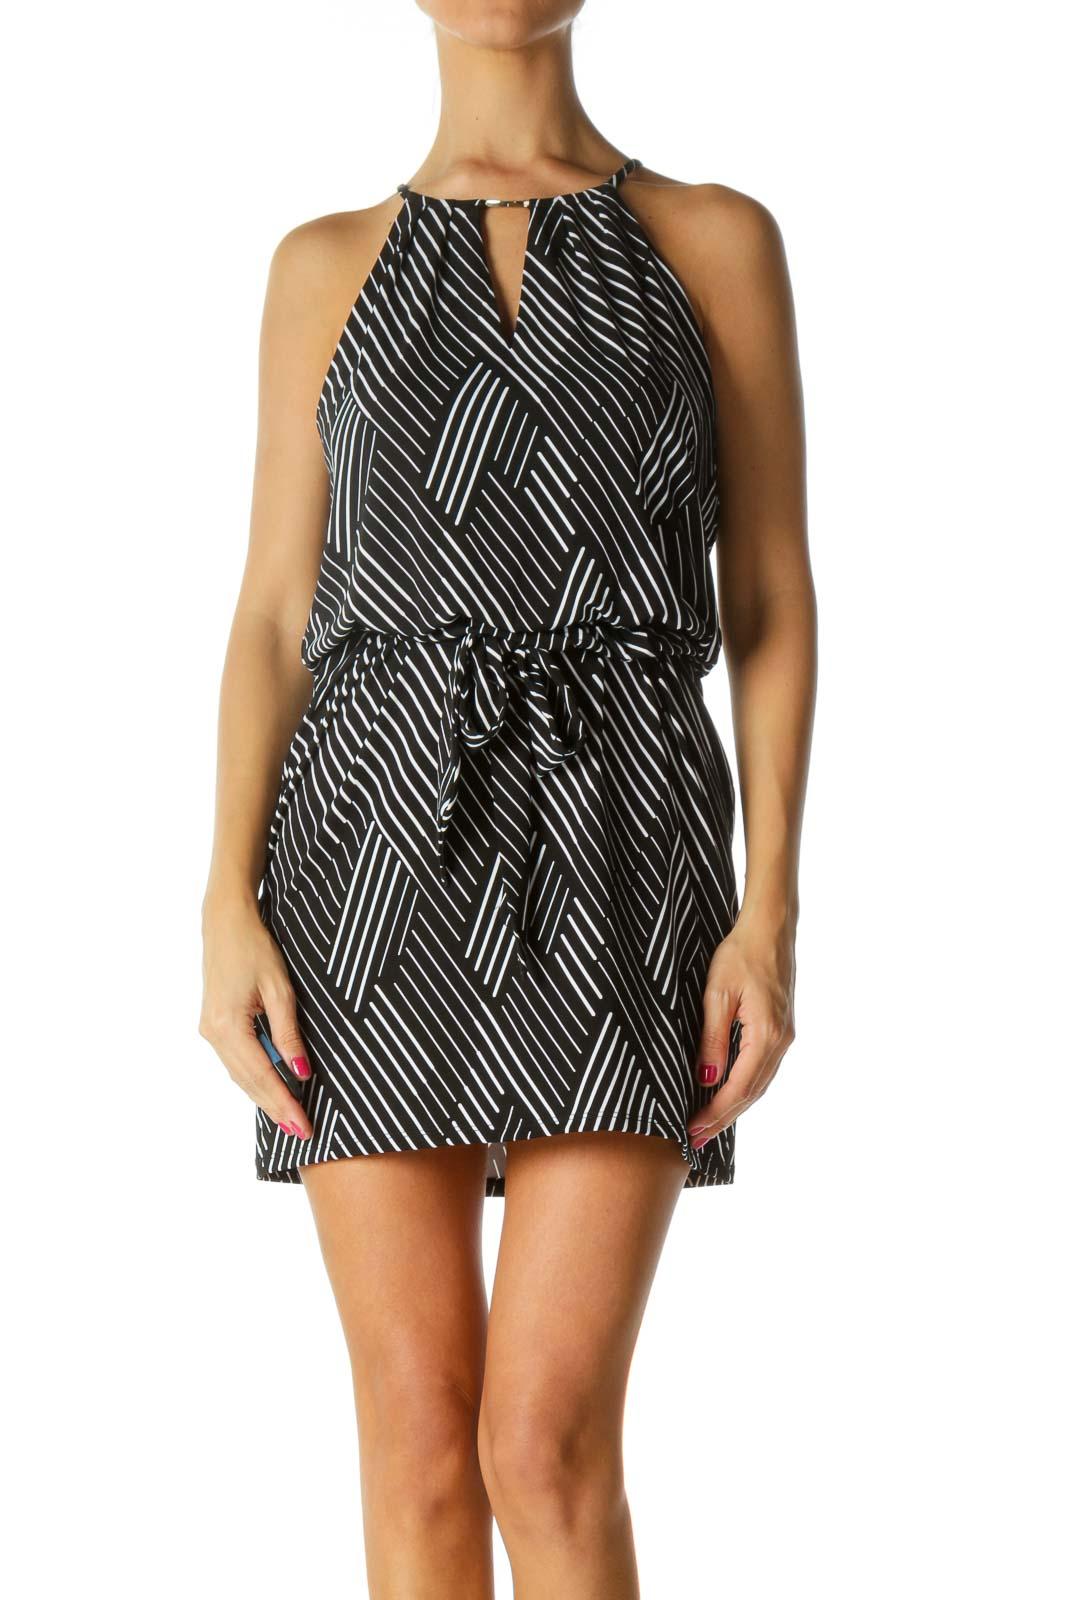 Black White Stripes Gold Keyhole Hardware Stretch Belted Dress